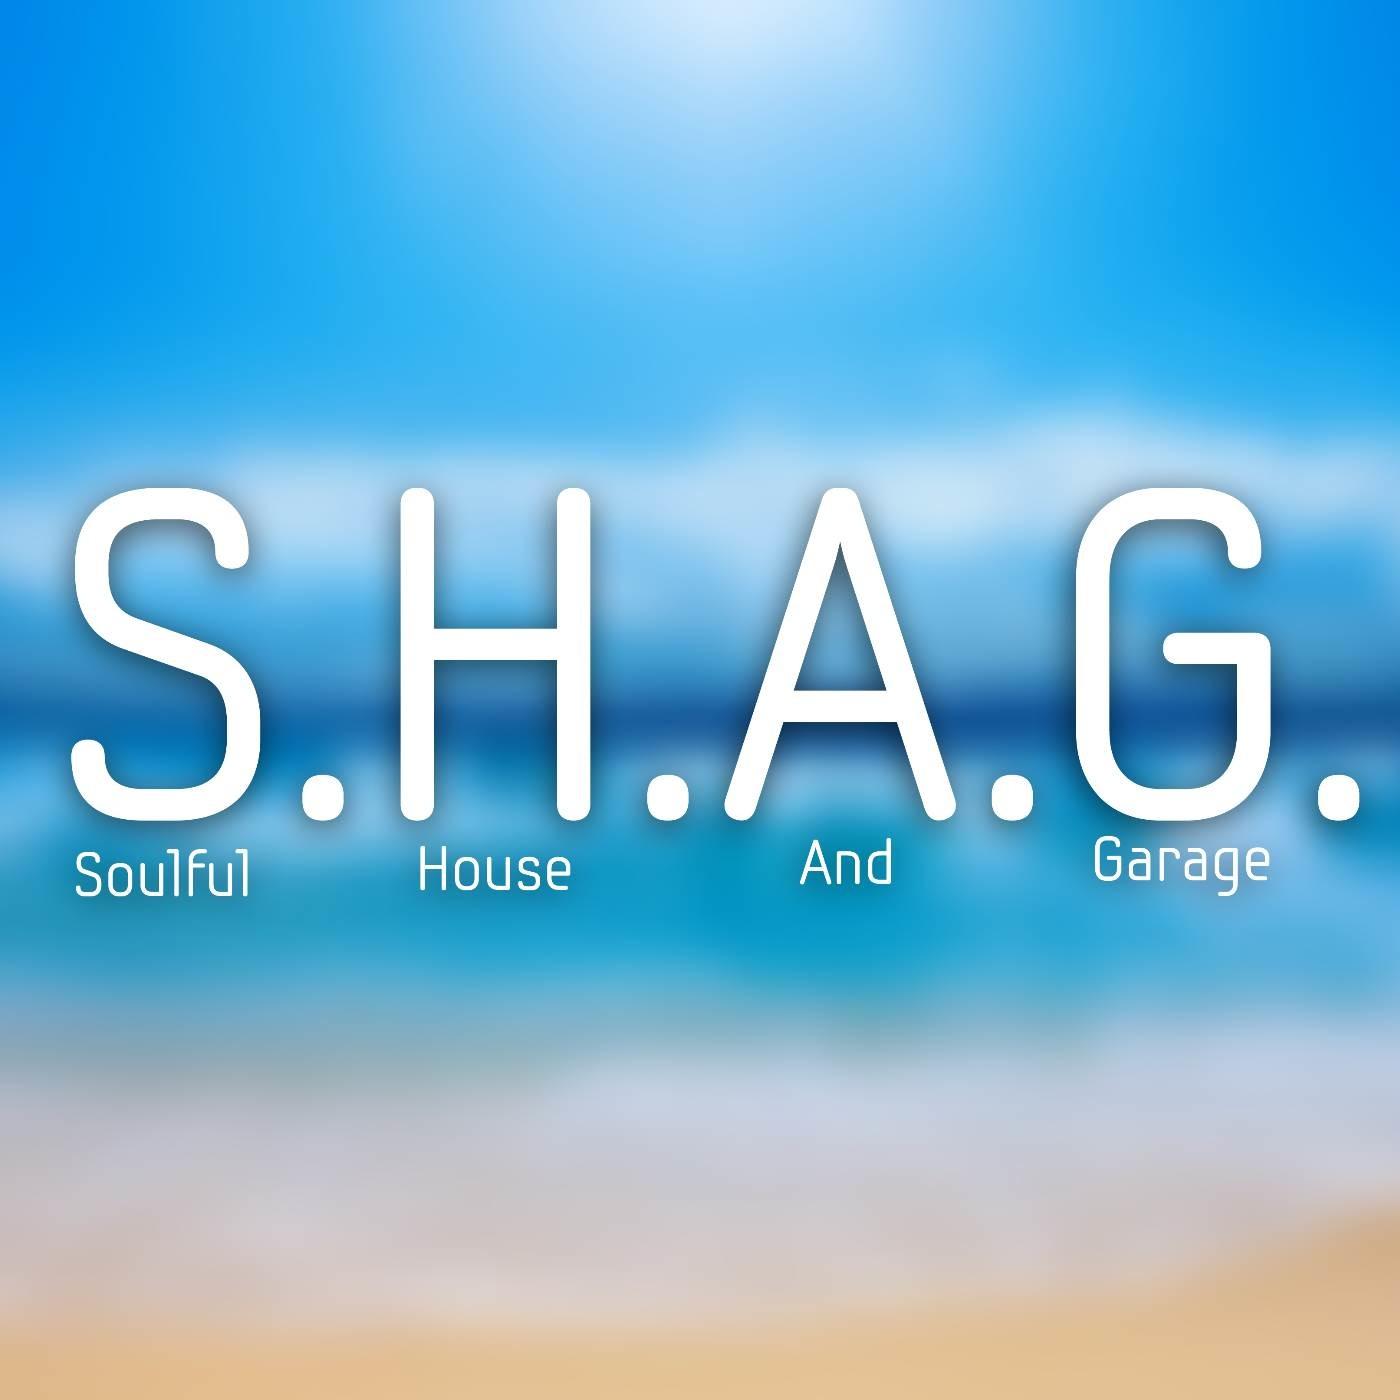 SHAG 5-Mar-2018 Soulful Afro House Mix DJP DJP's S H A G